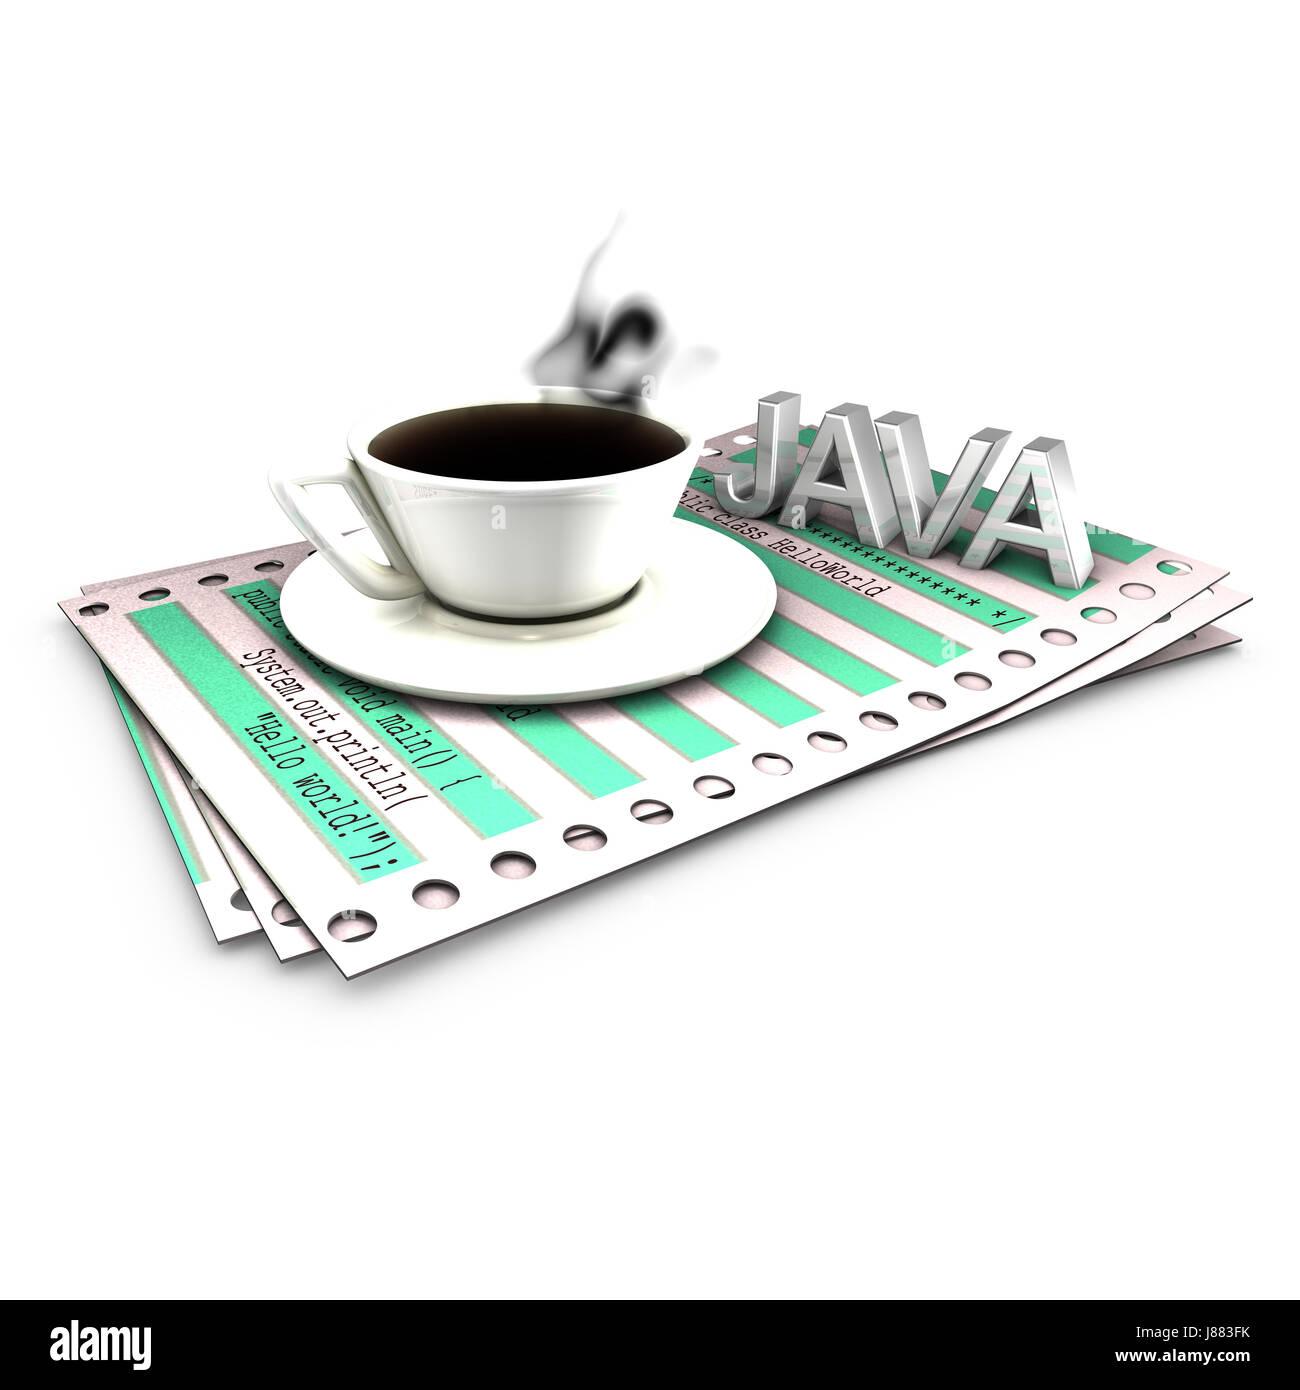 print, language, programming, listing, sheet of paper, paper, coffee, - Stock Image